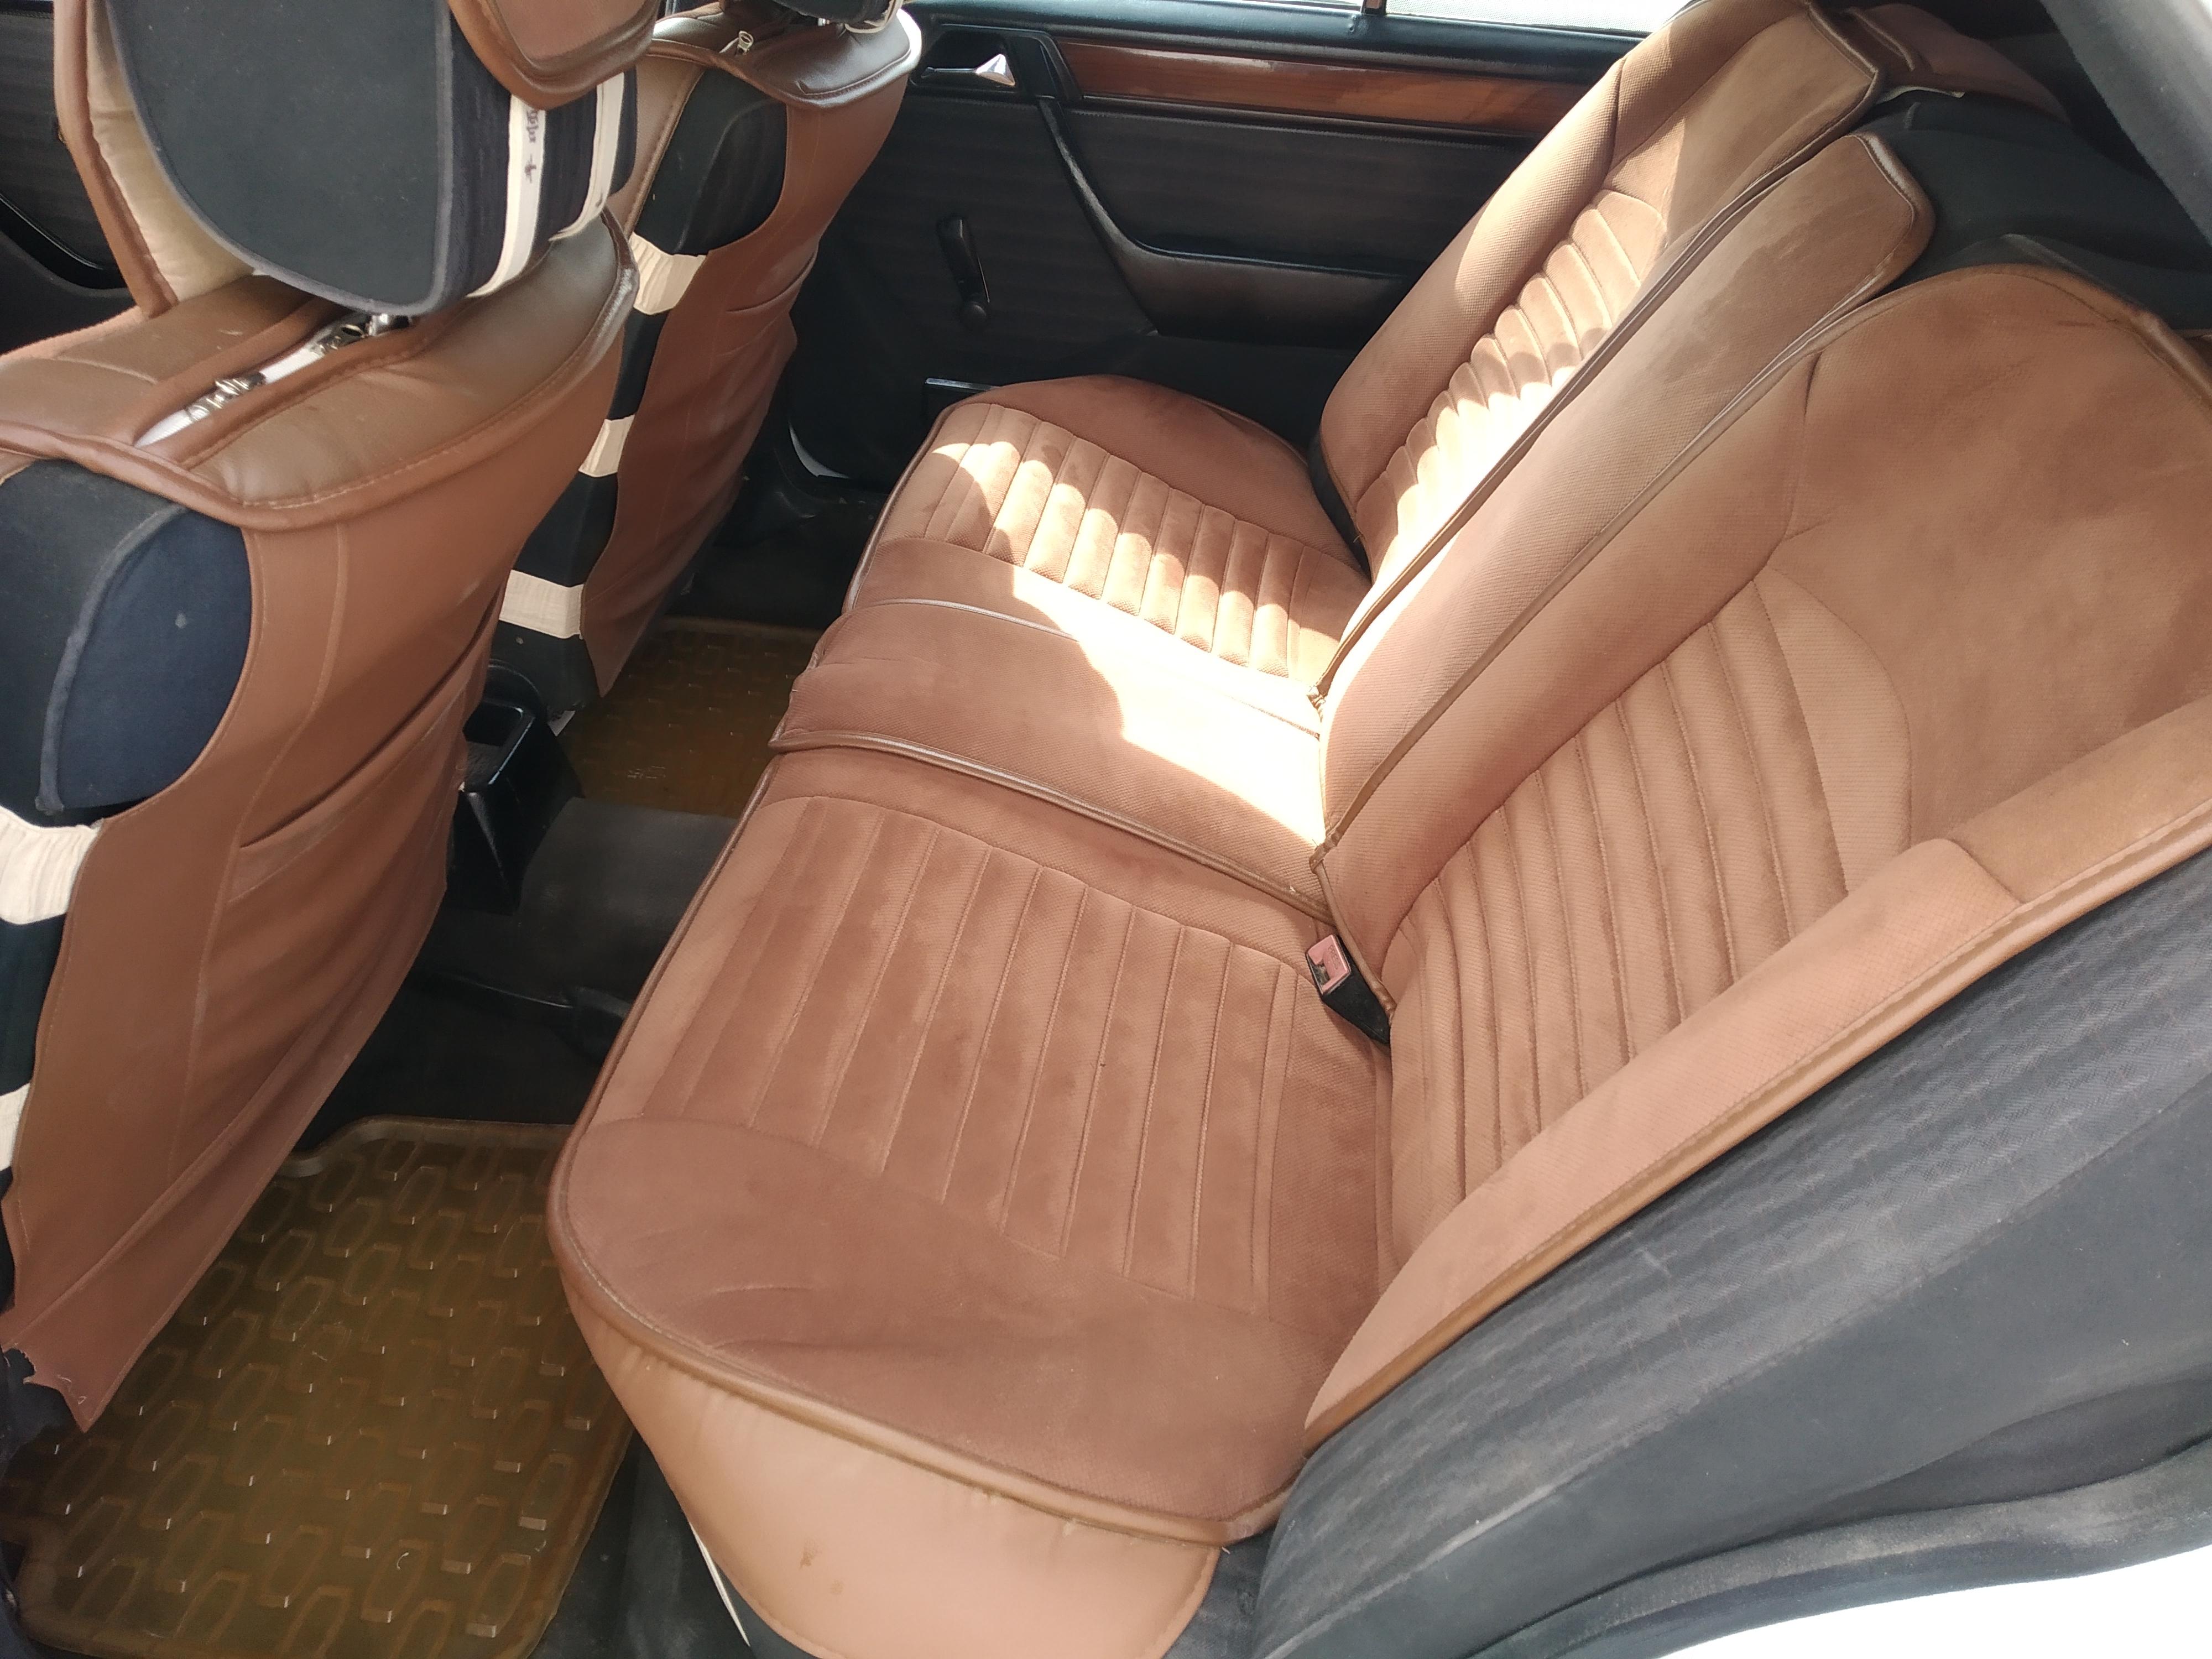 Mercedes-Benz E 230 2.3(lt) 1990 Подержанный  $2000